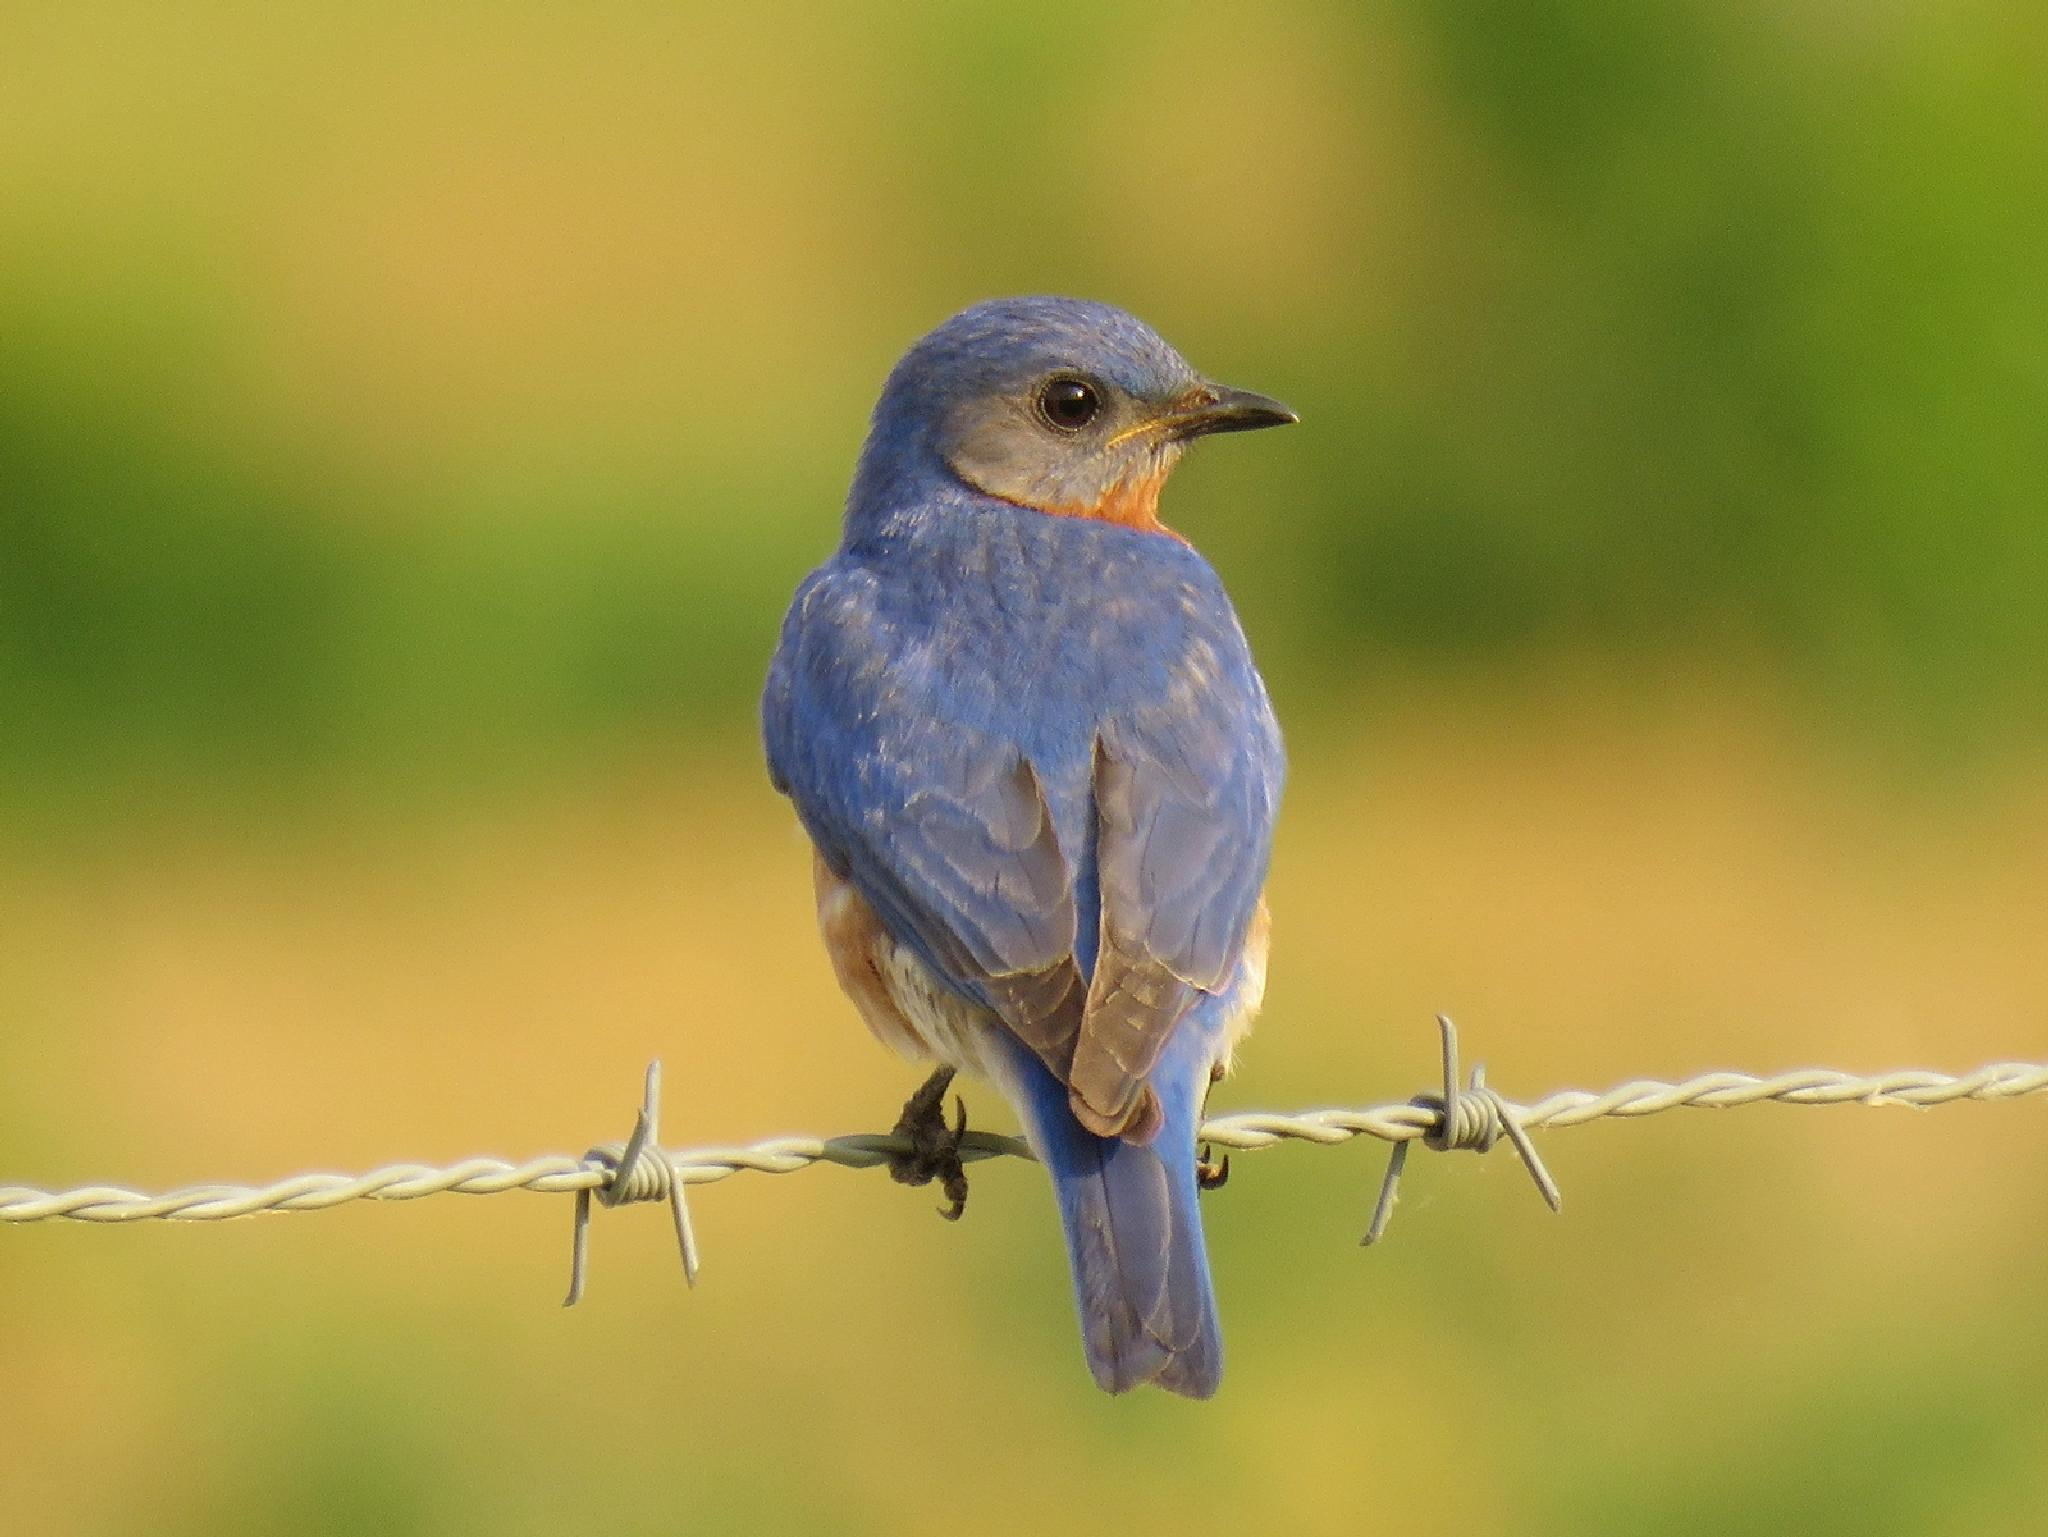 Bluebird by LonnaOurs